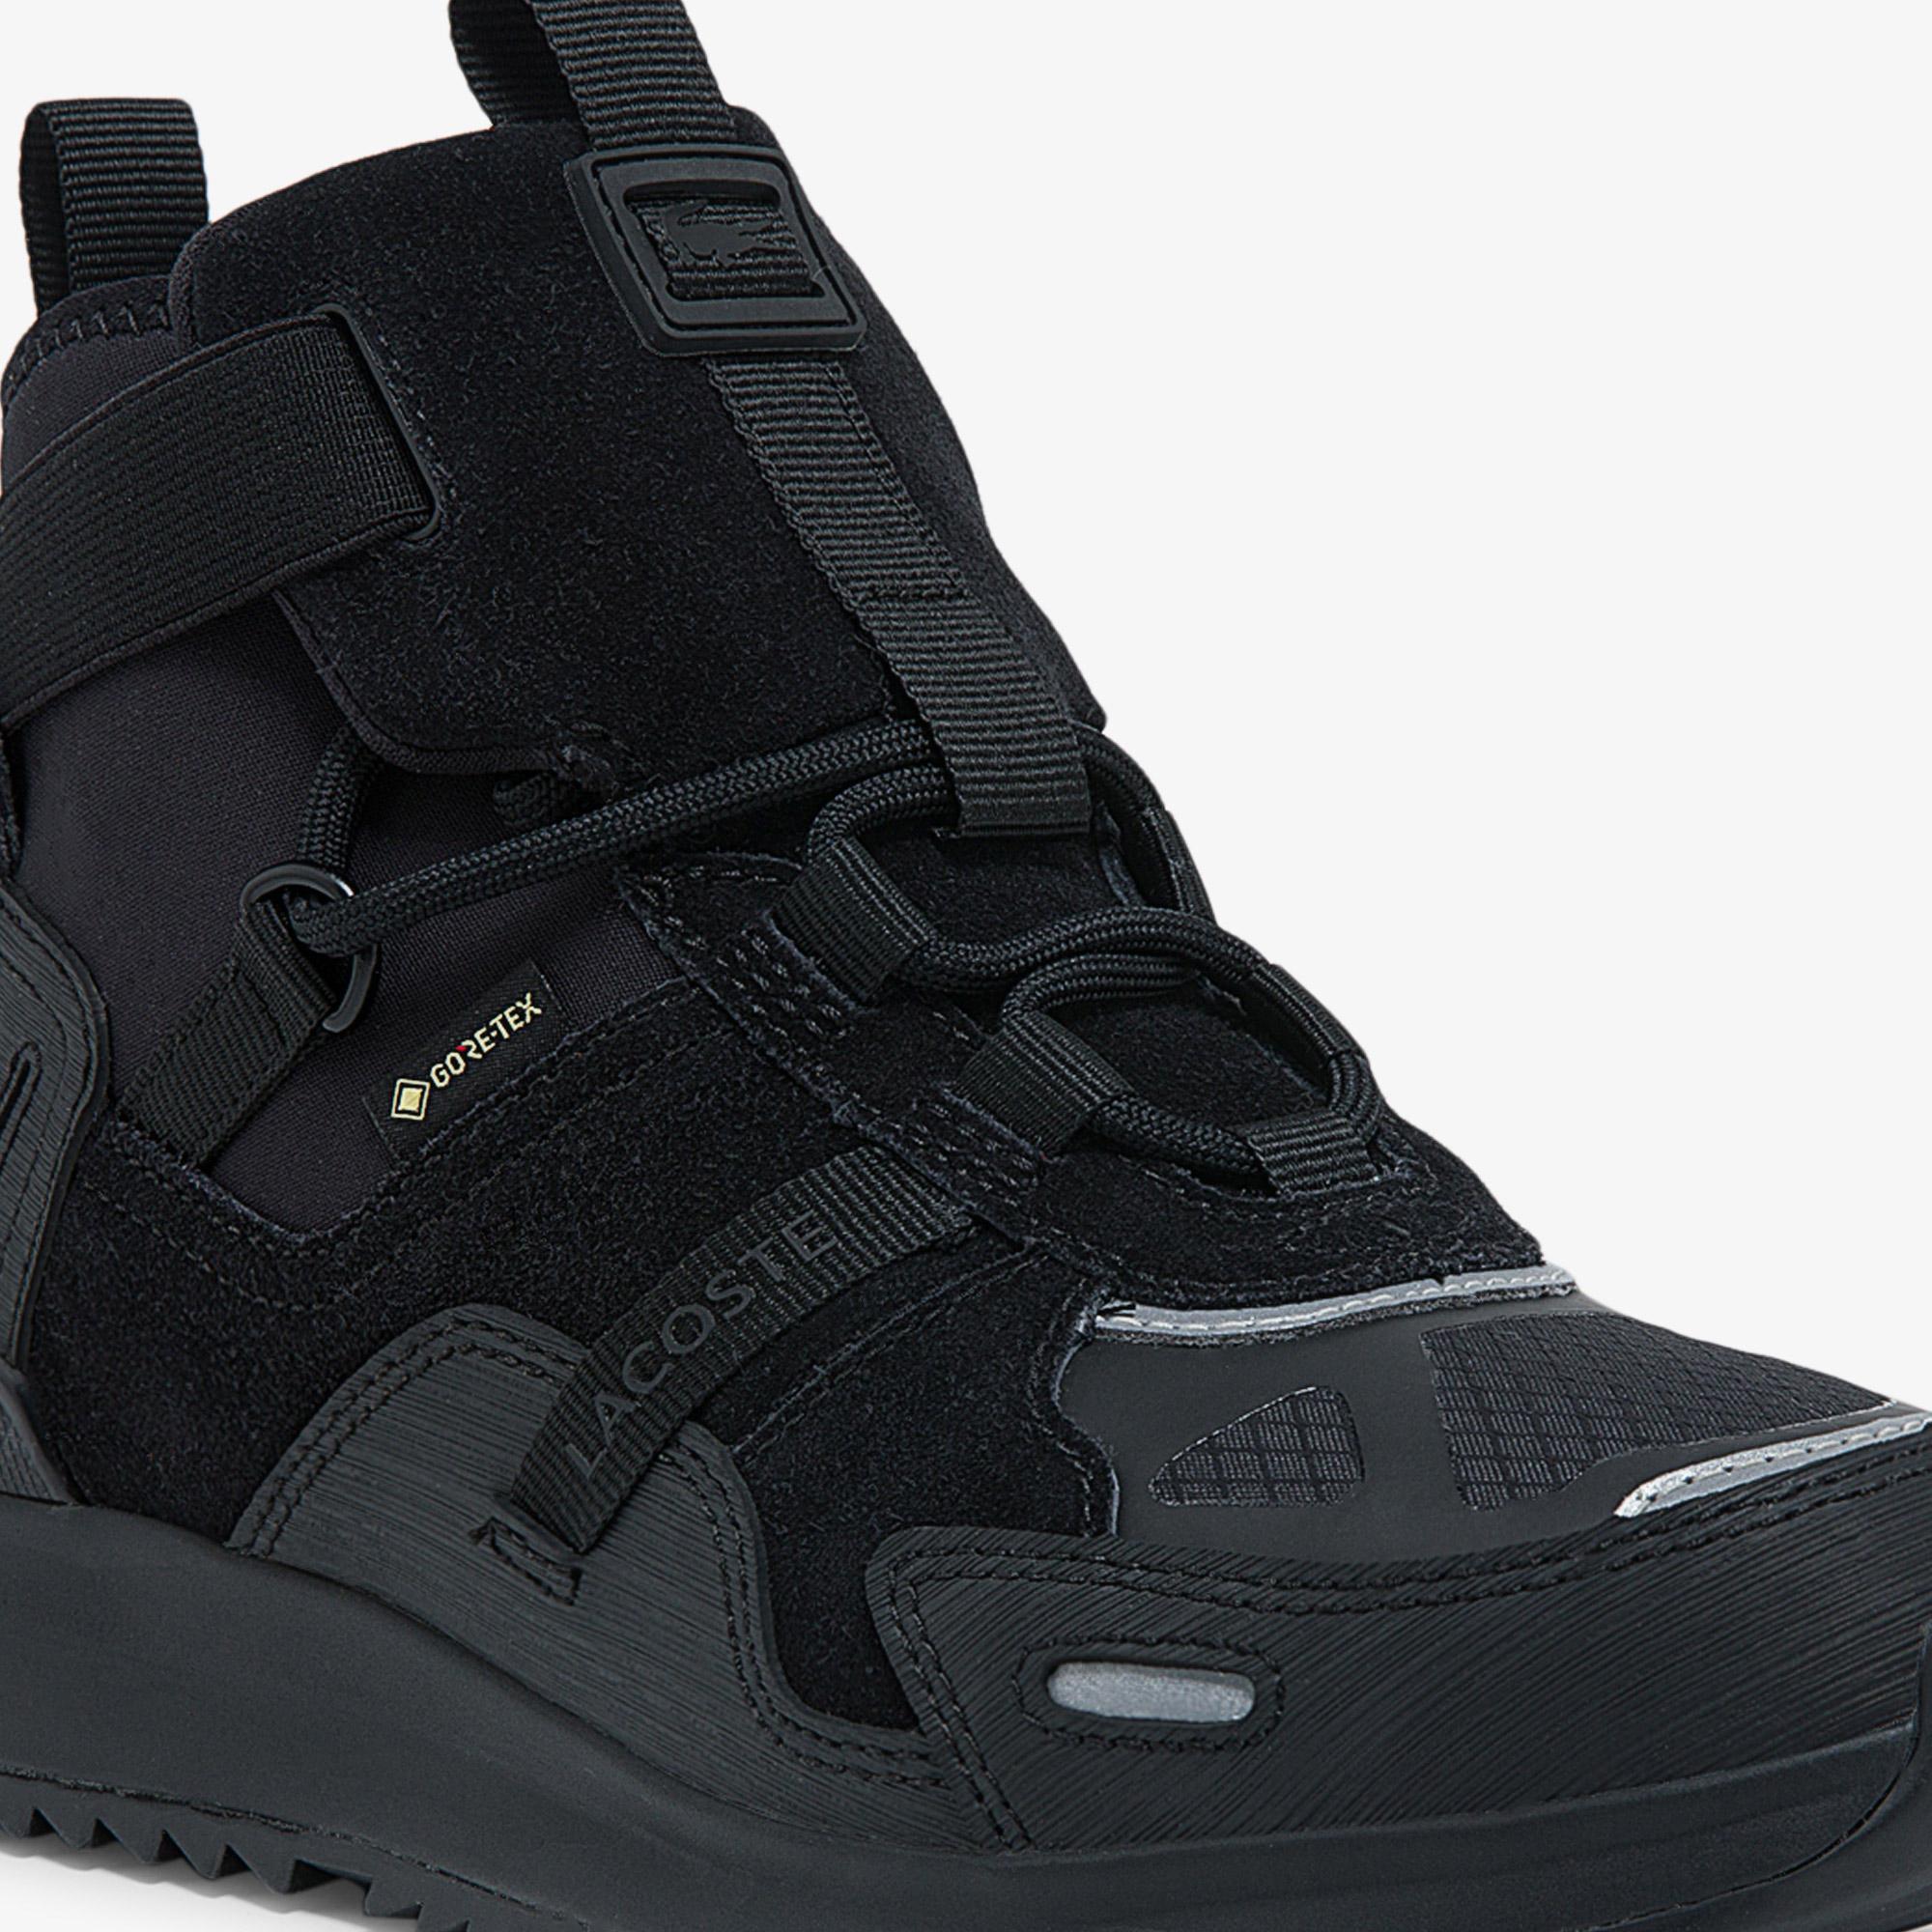 Lacoste Women's Run Breaker GTX Synthetic and Suede Sneakers